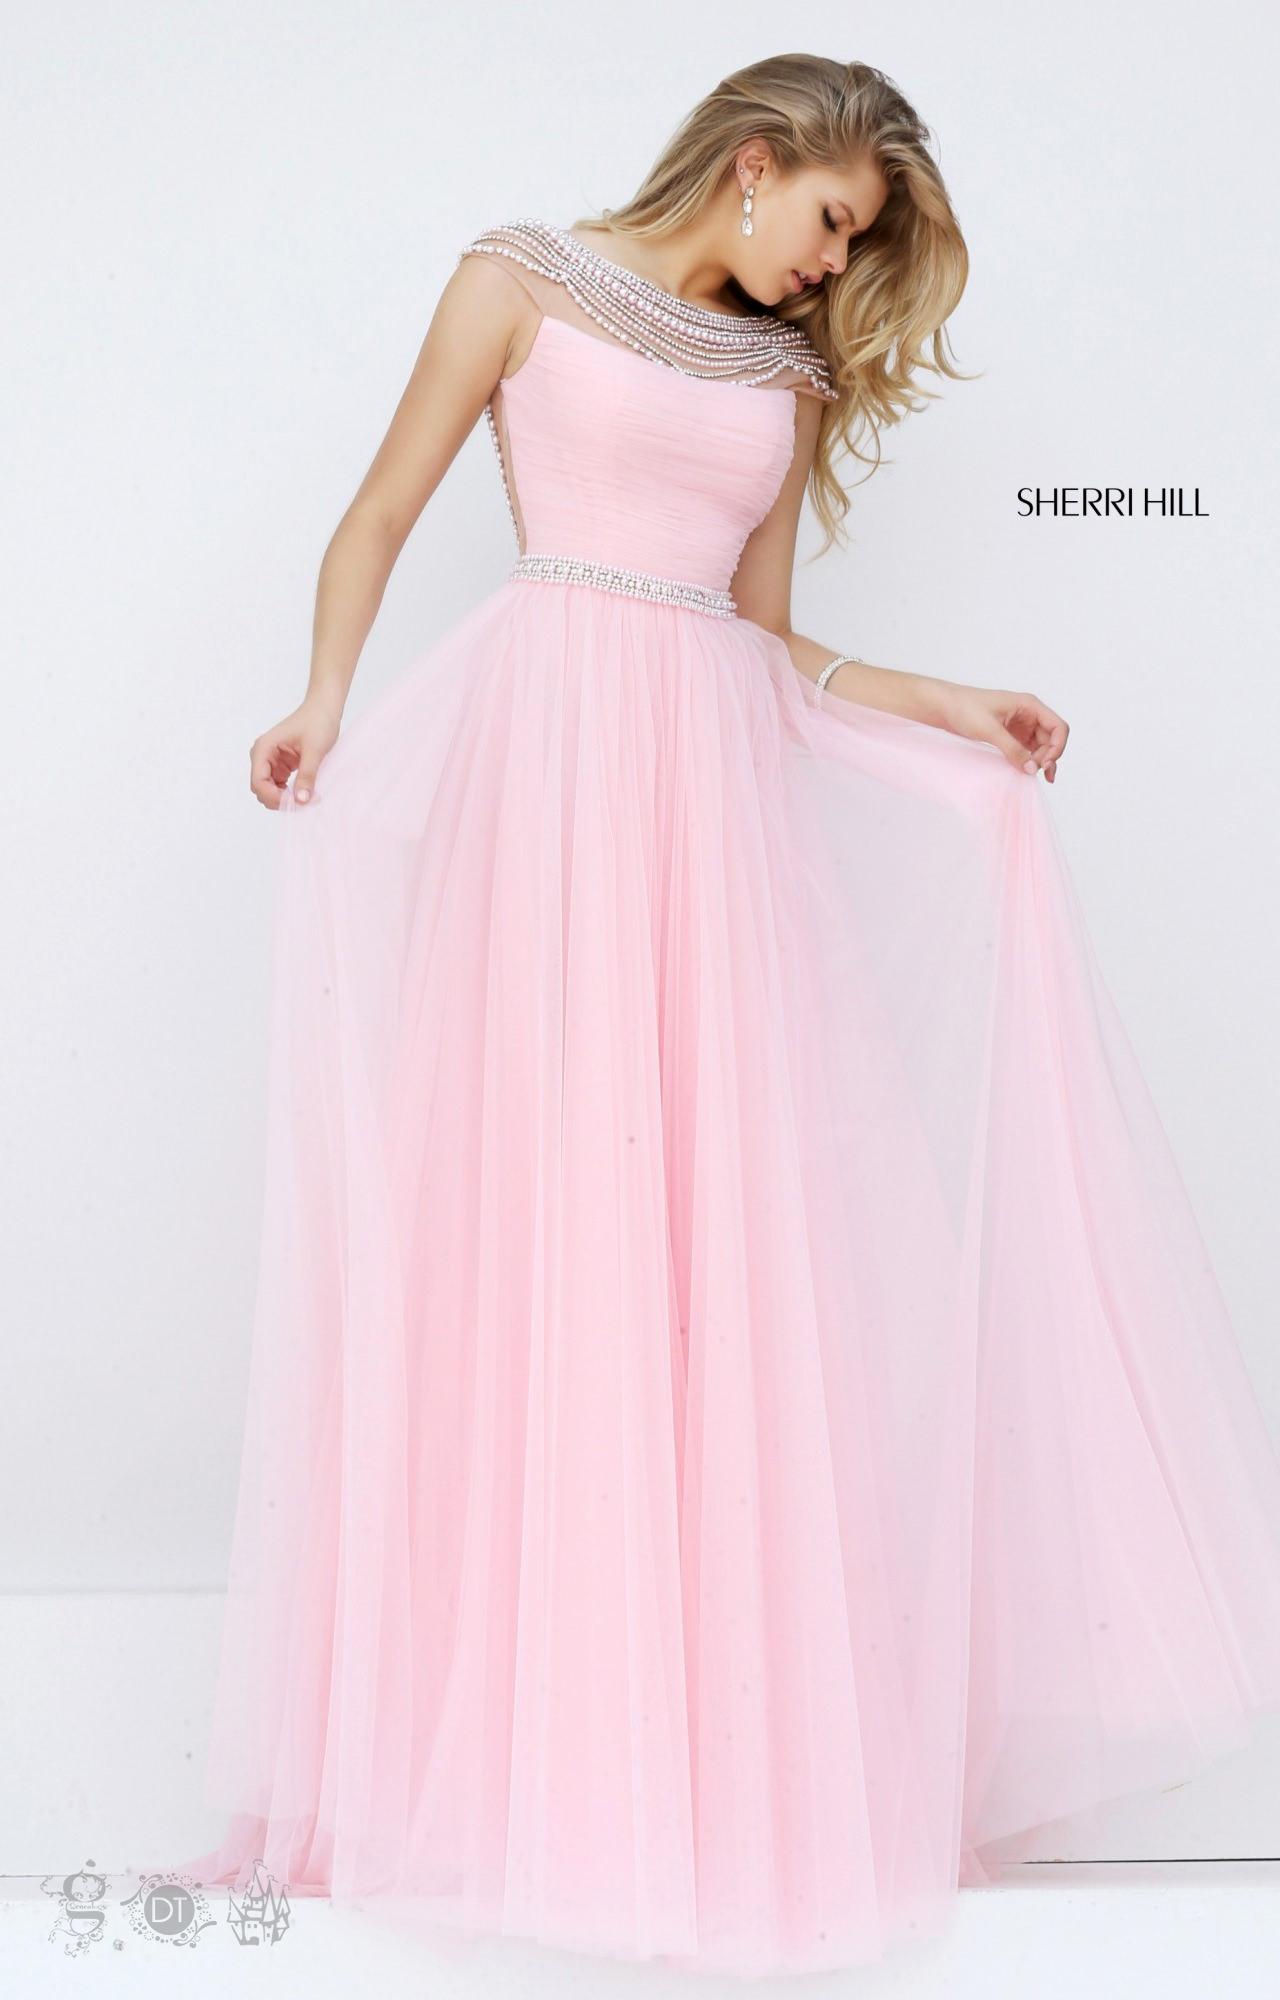 Moderno Prom Dresses Light In The Box Elaboración - Ideas de Estilos ...